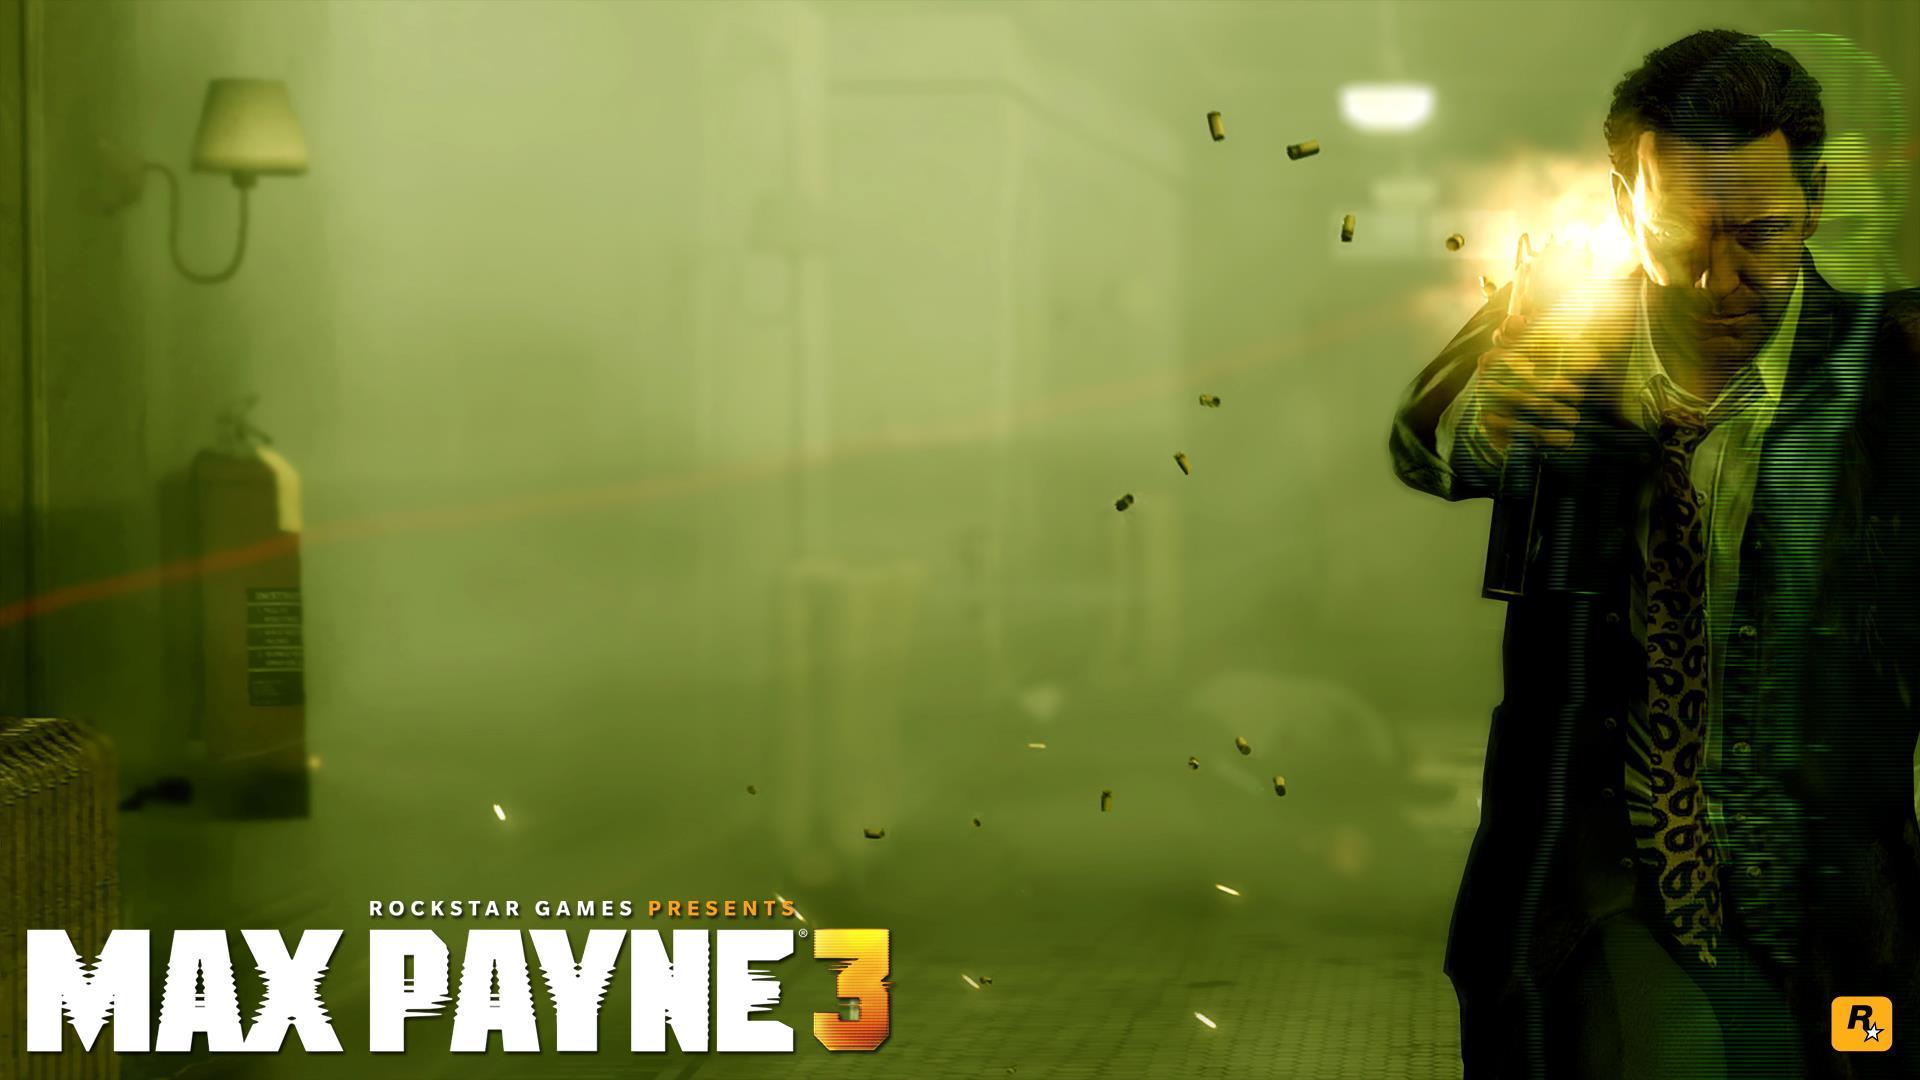 Video Game Max Payne 3 Wallpaper 1920x1080